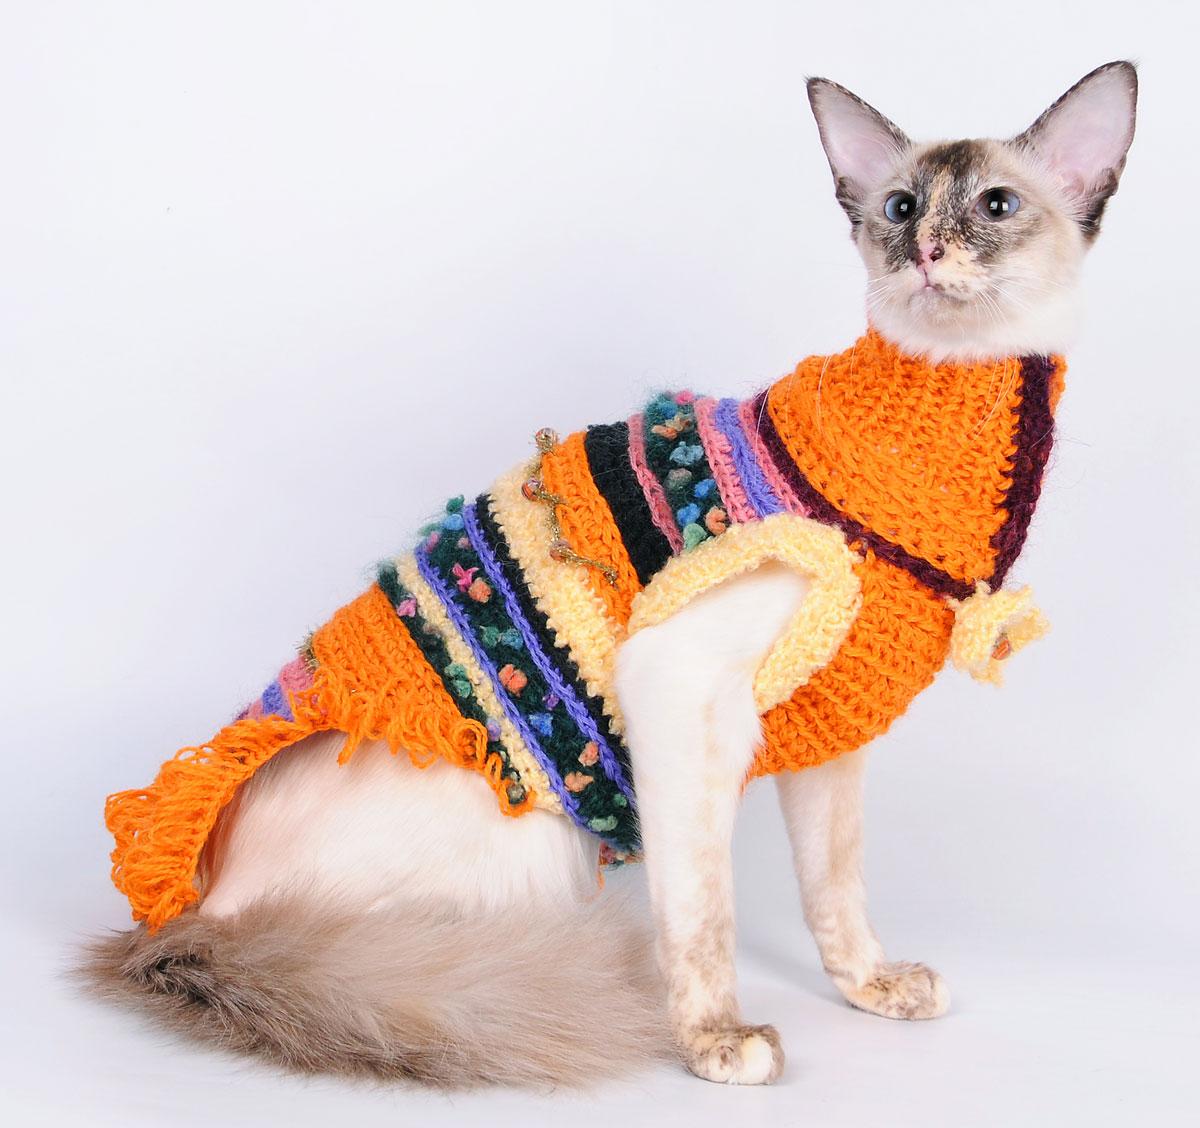 картинки кошек на одежде отец национальности